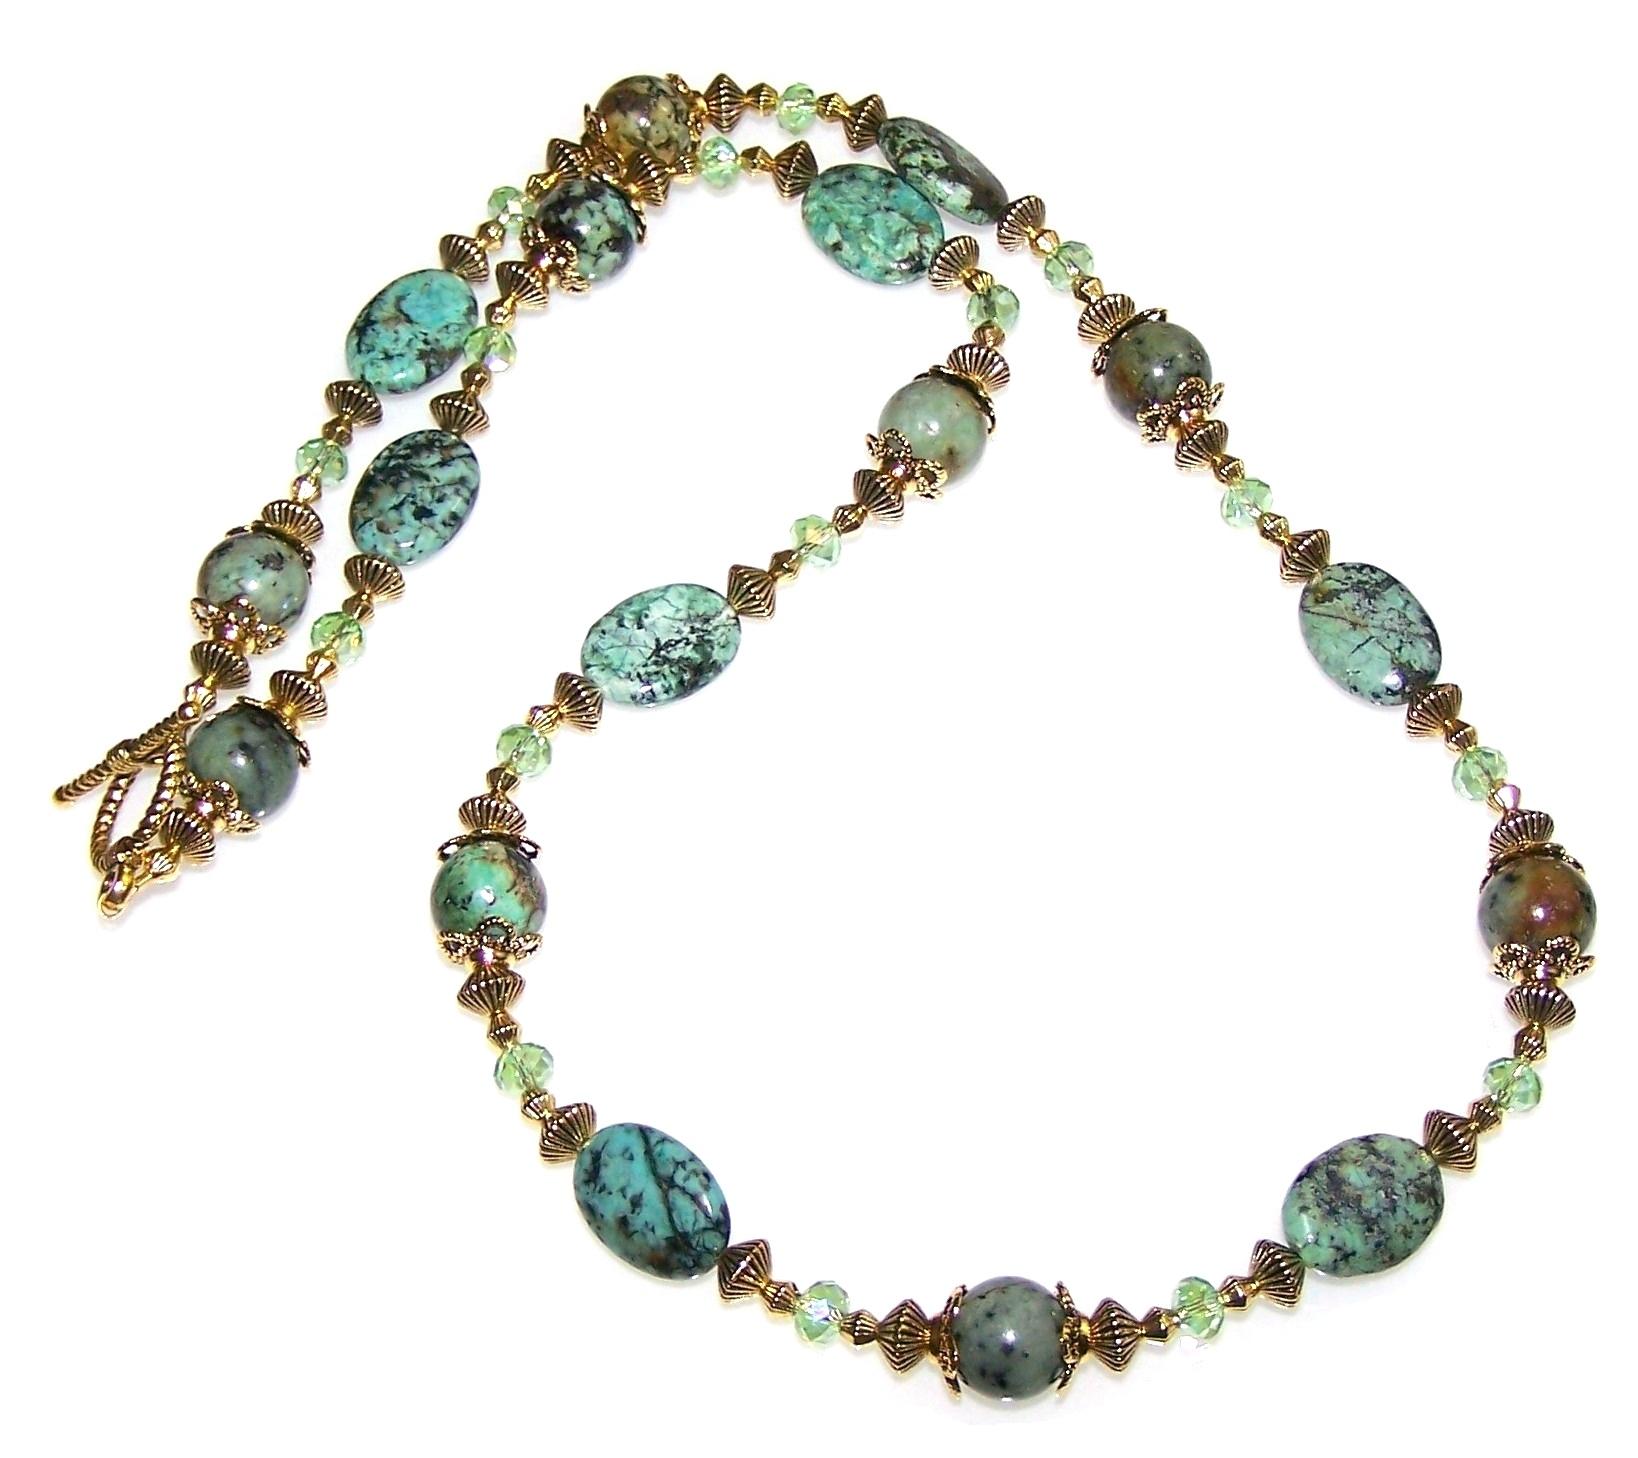 Free Beaded Jewelry Patterns